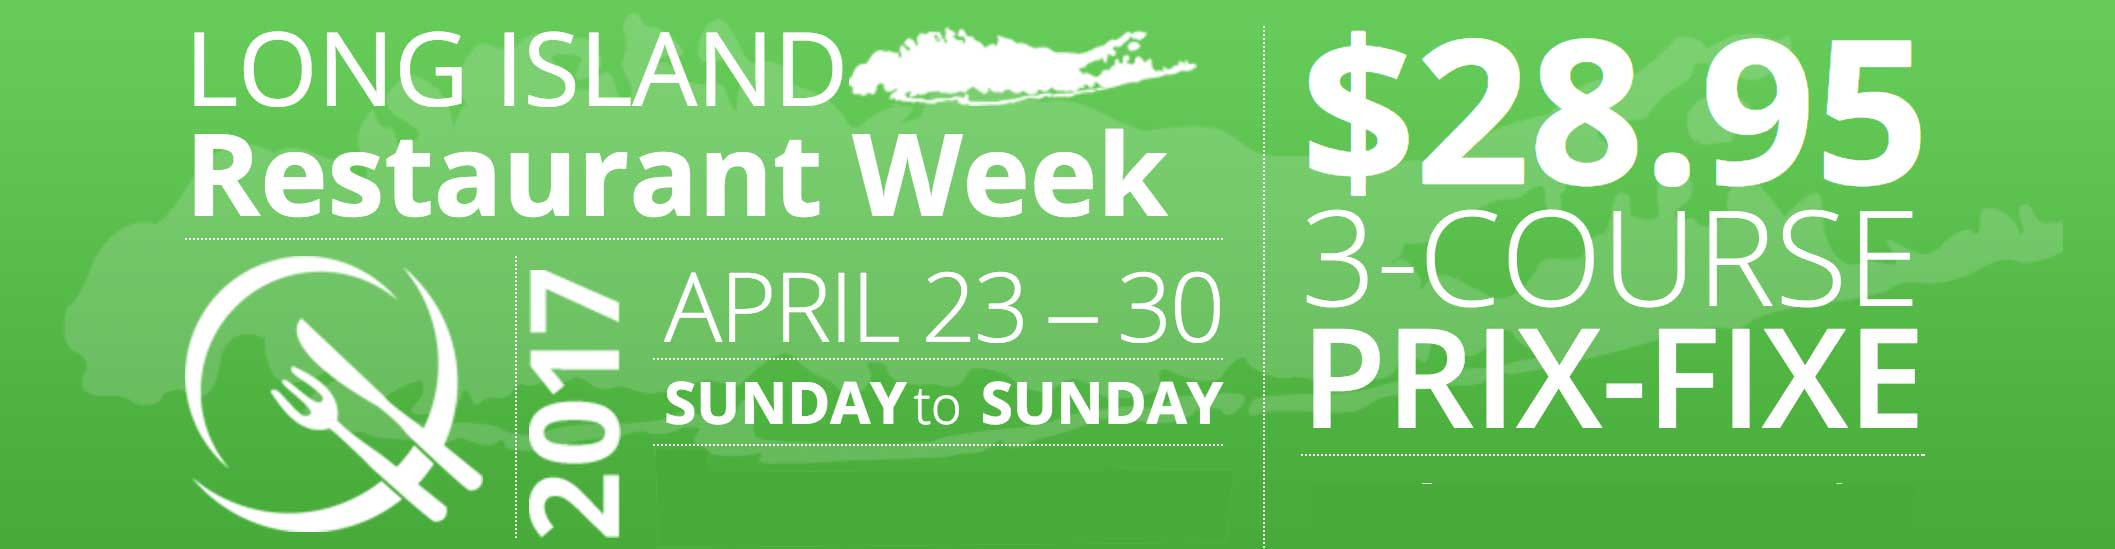 Long Island Restaurant Week April 23-30